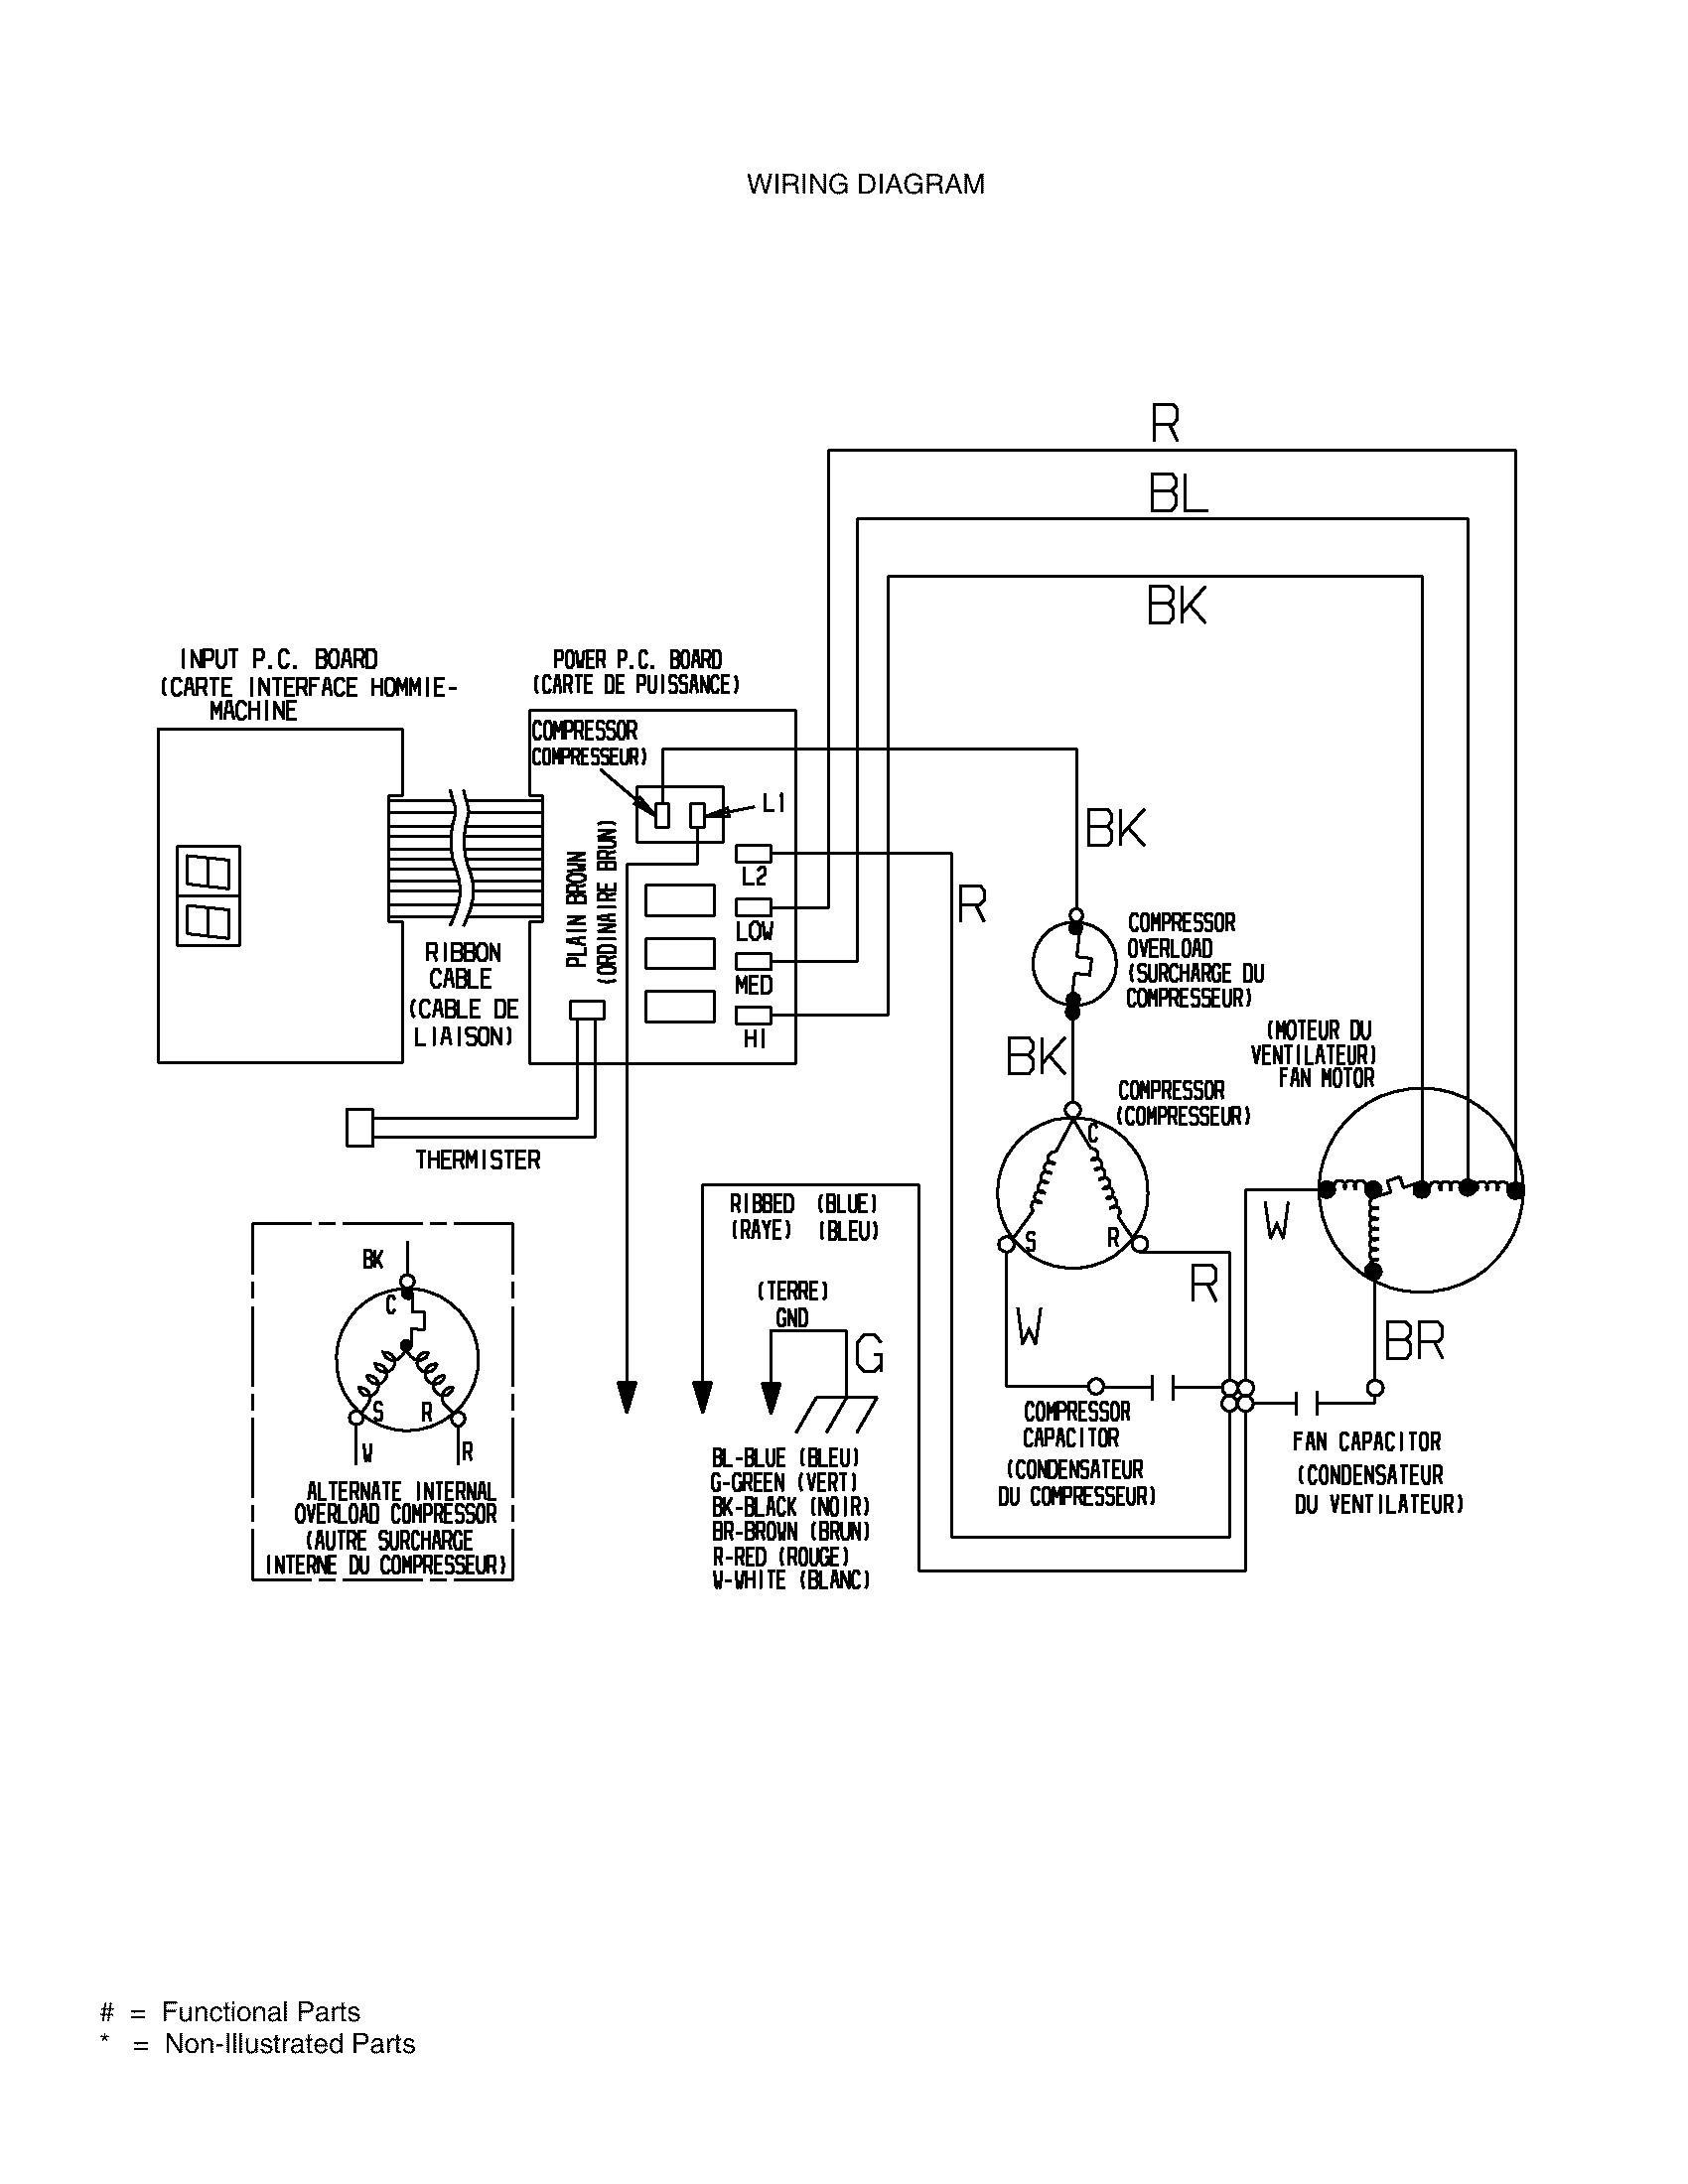 sew eurodrive wiring diagrams 850230840 house wiring diagram symbols u2022 rh maxturner co sew eurodrive 6 lead motor wiring diagram sew eurodrive motor brake wiring diagram